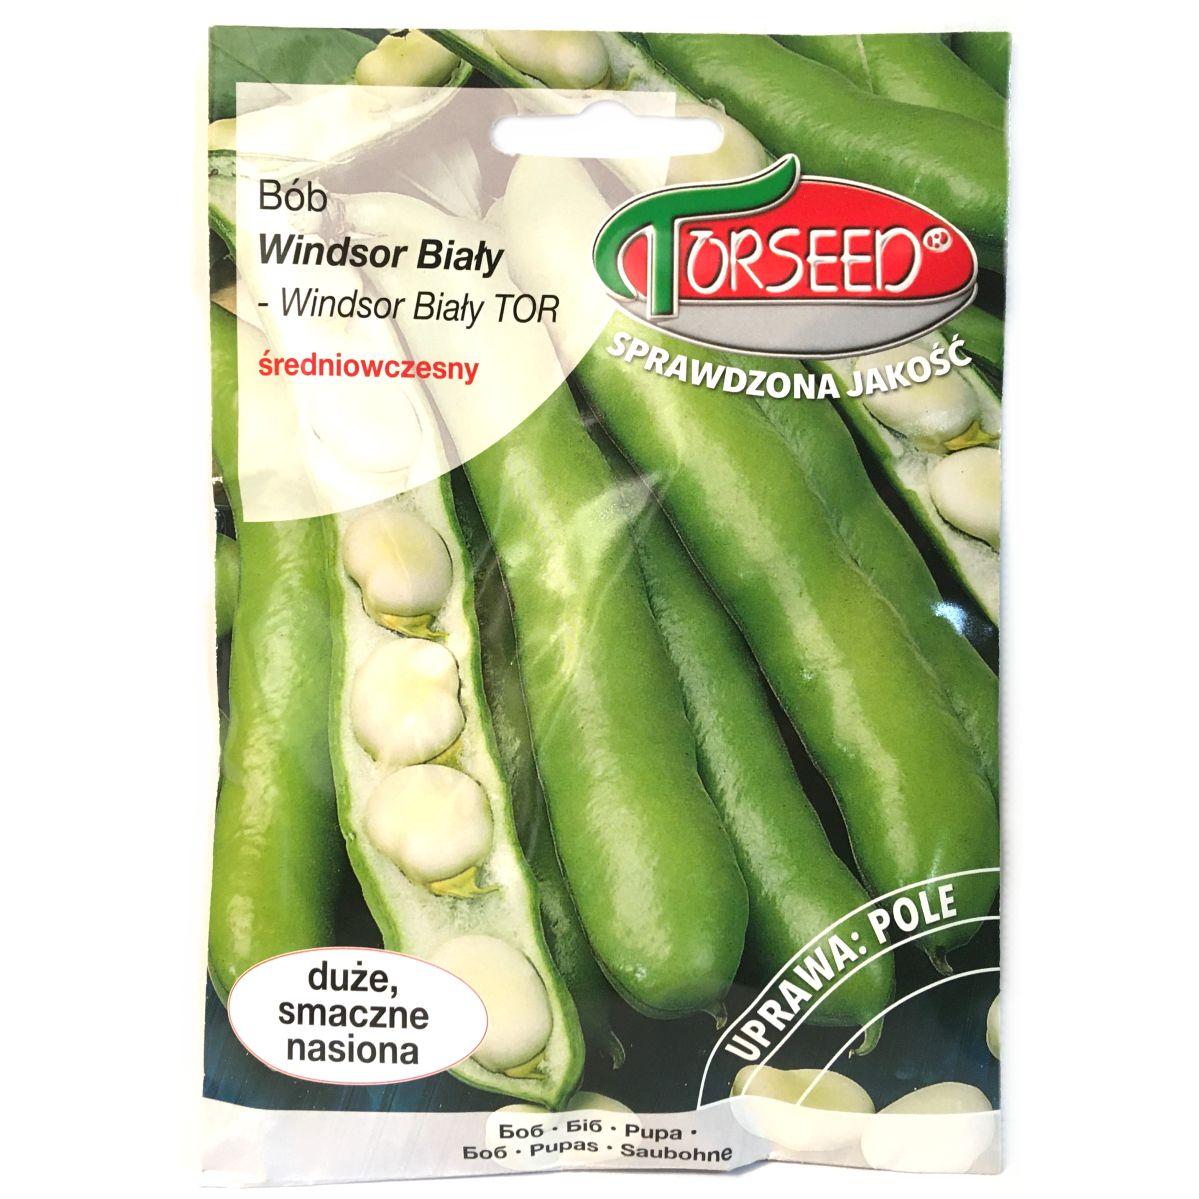 Bób Windsor Biały nasiona Torseed